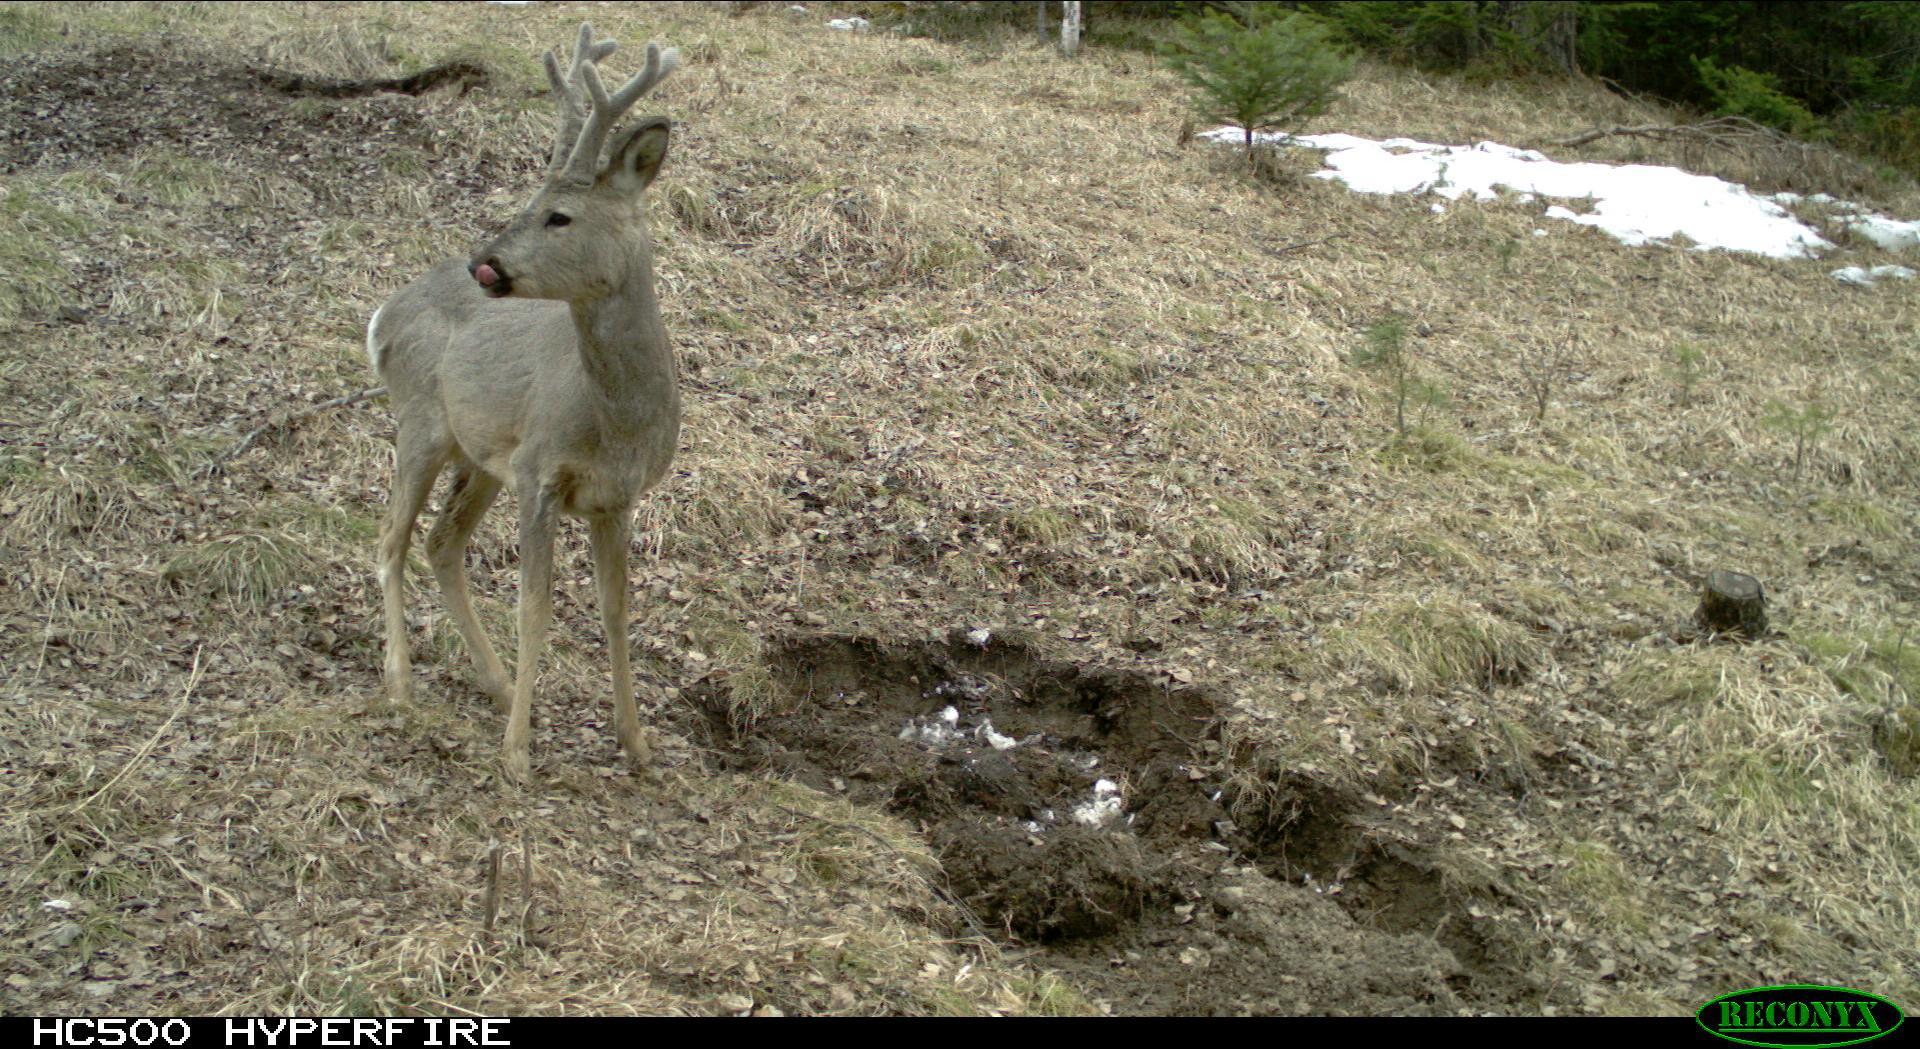 Siberian Roe Deer During The Rut In 2021 within 2021 Deer Rut